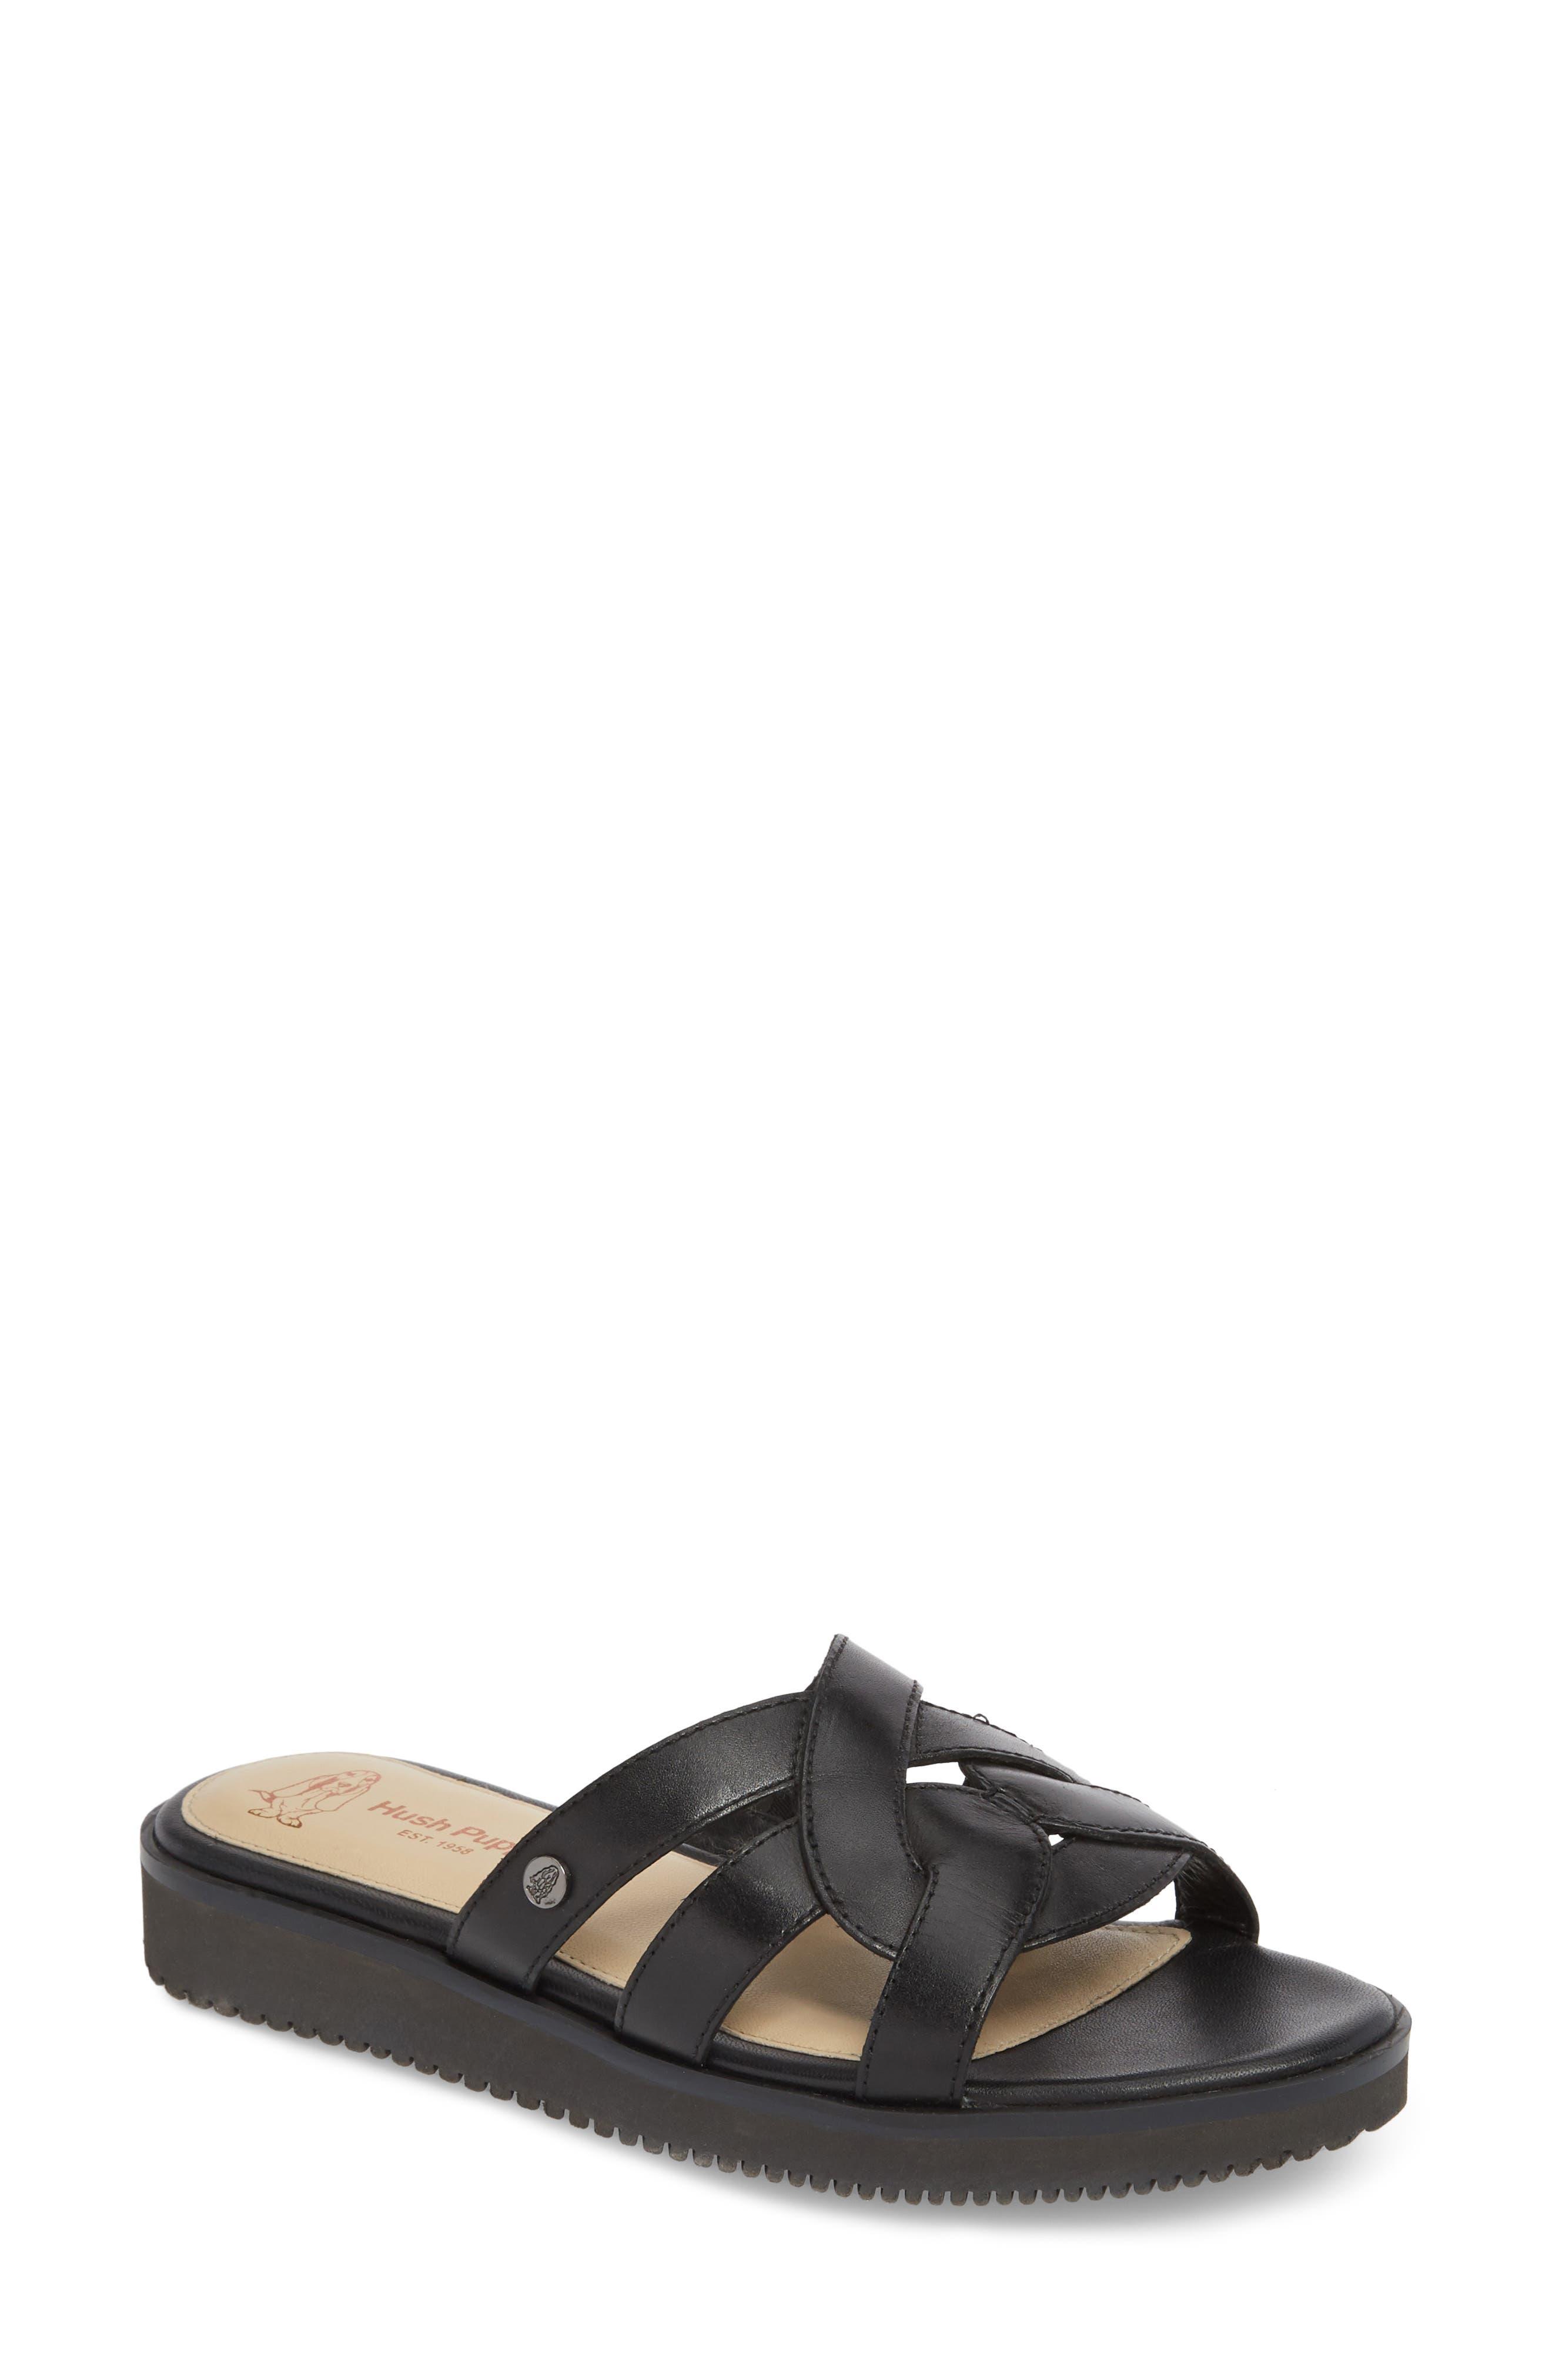 Braid Slide Sandal,                         Main,                         color, 007